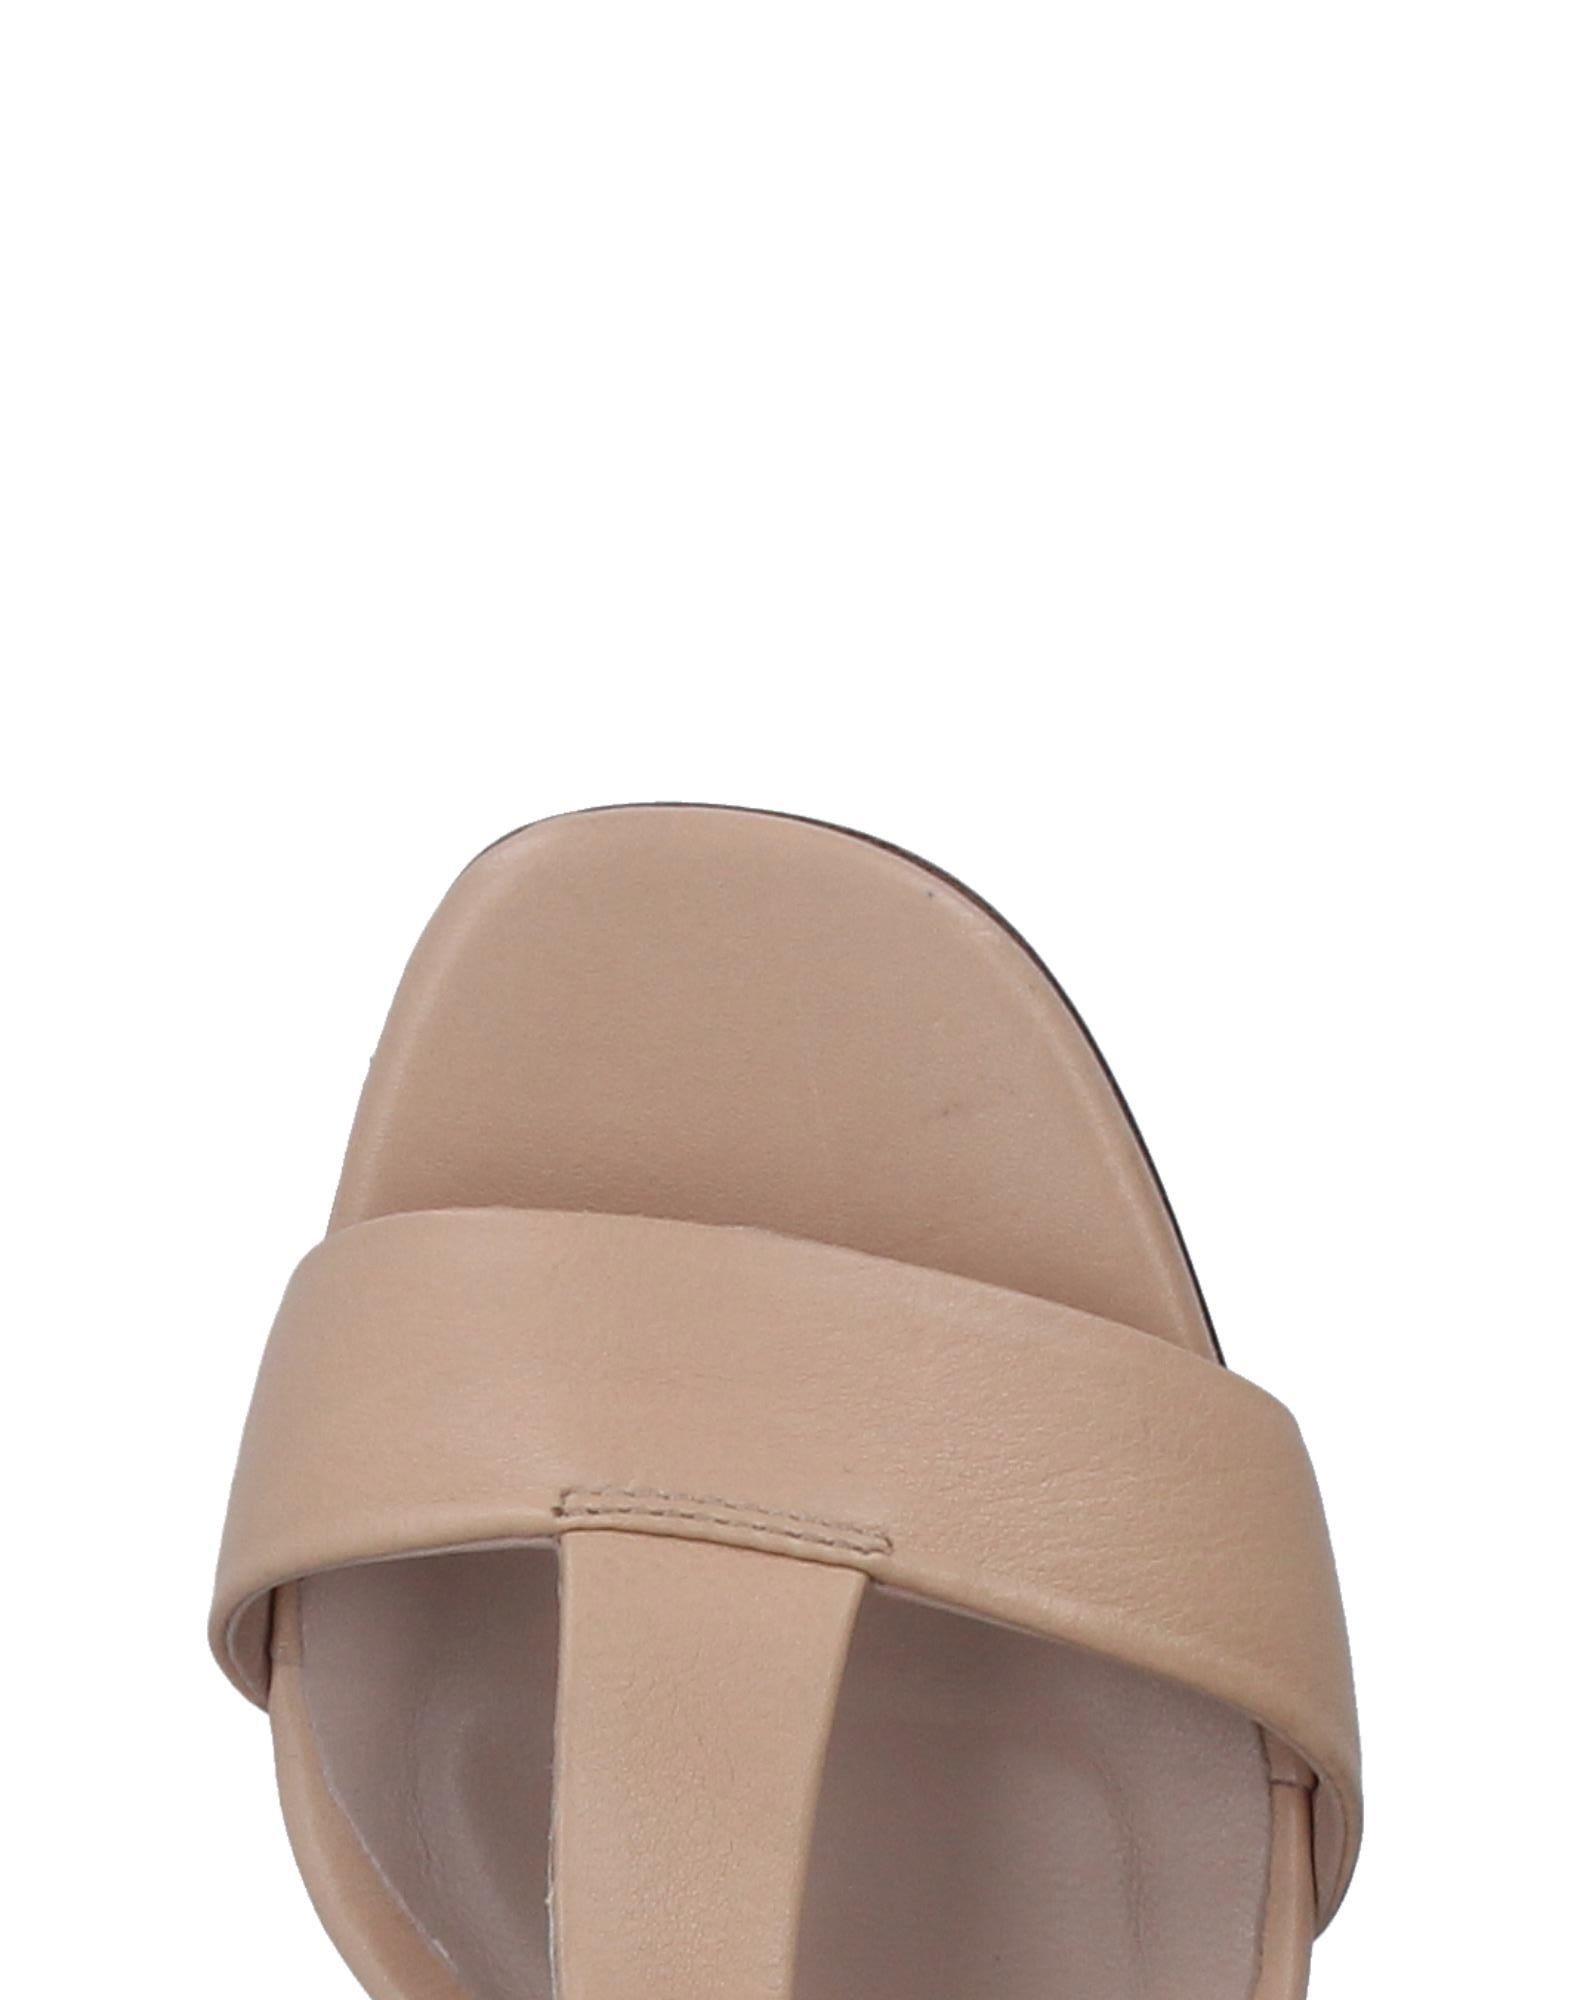 Gut Janet um billige Schuhe zu tragenJanet & Janet Gut Sandalen Damen  11281441AU 8f494a